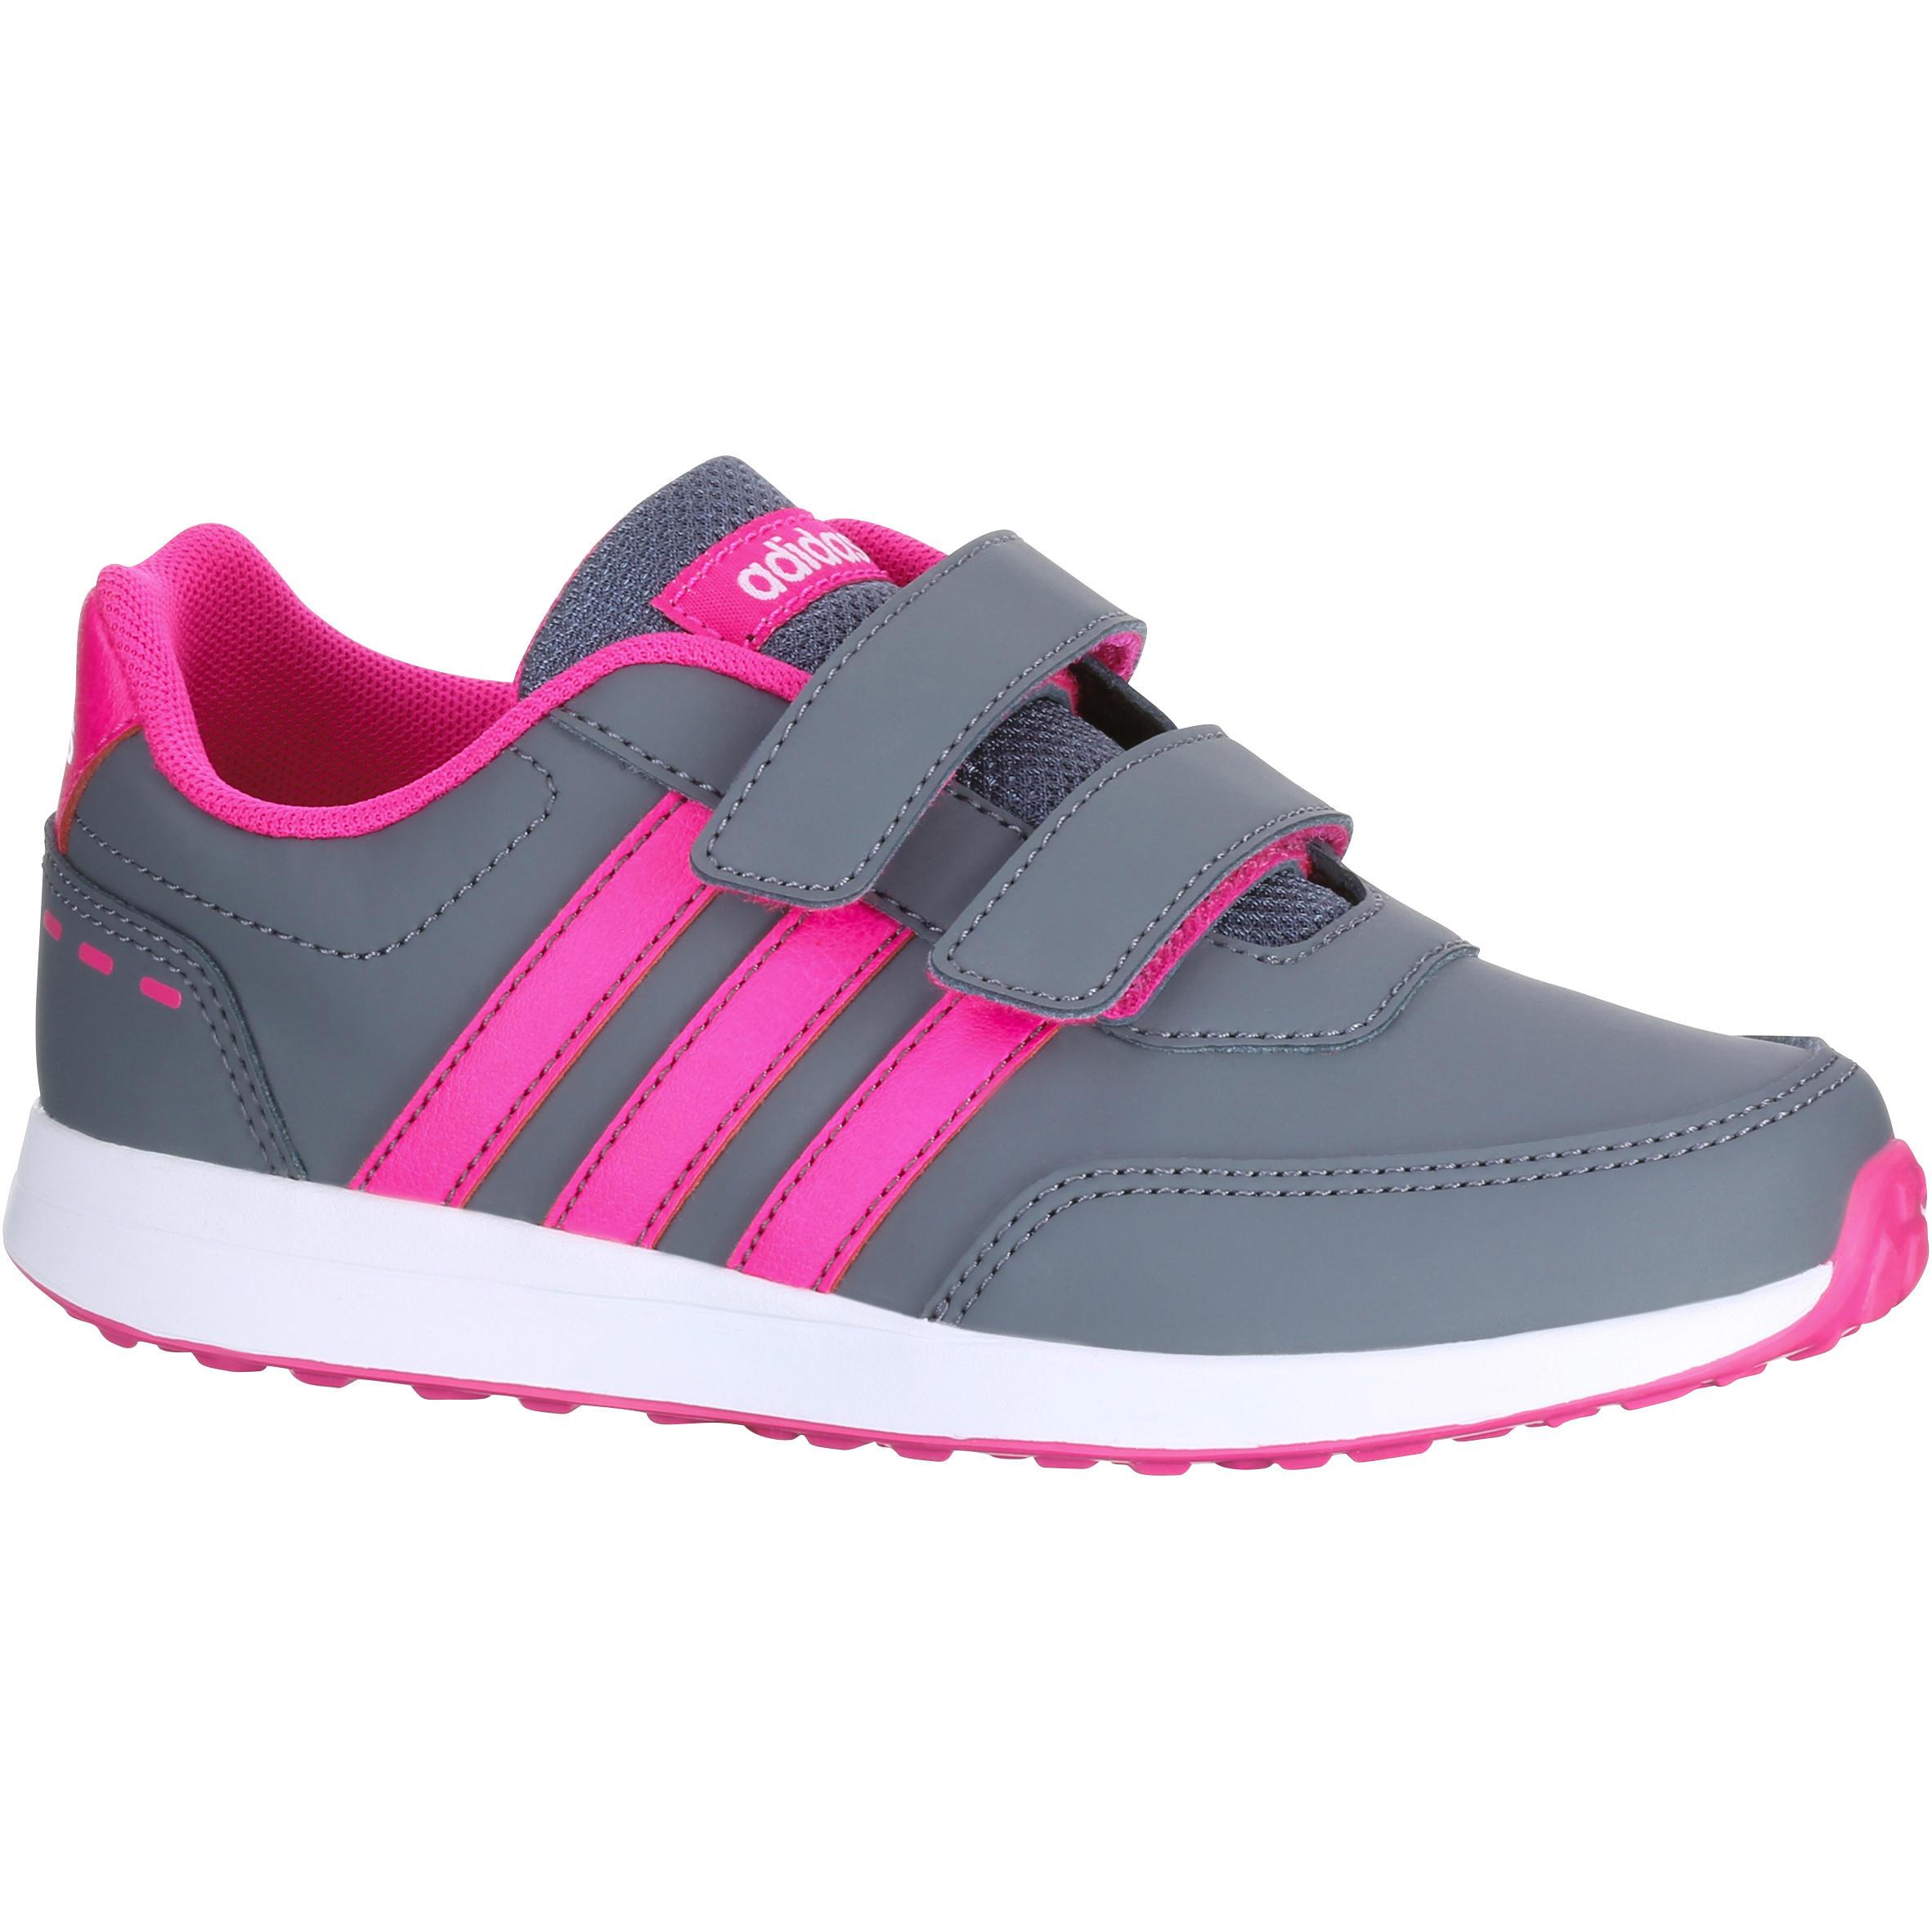 Kindersneakers Switch grijs-roze